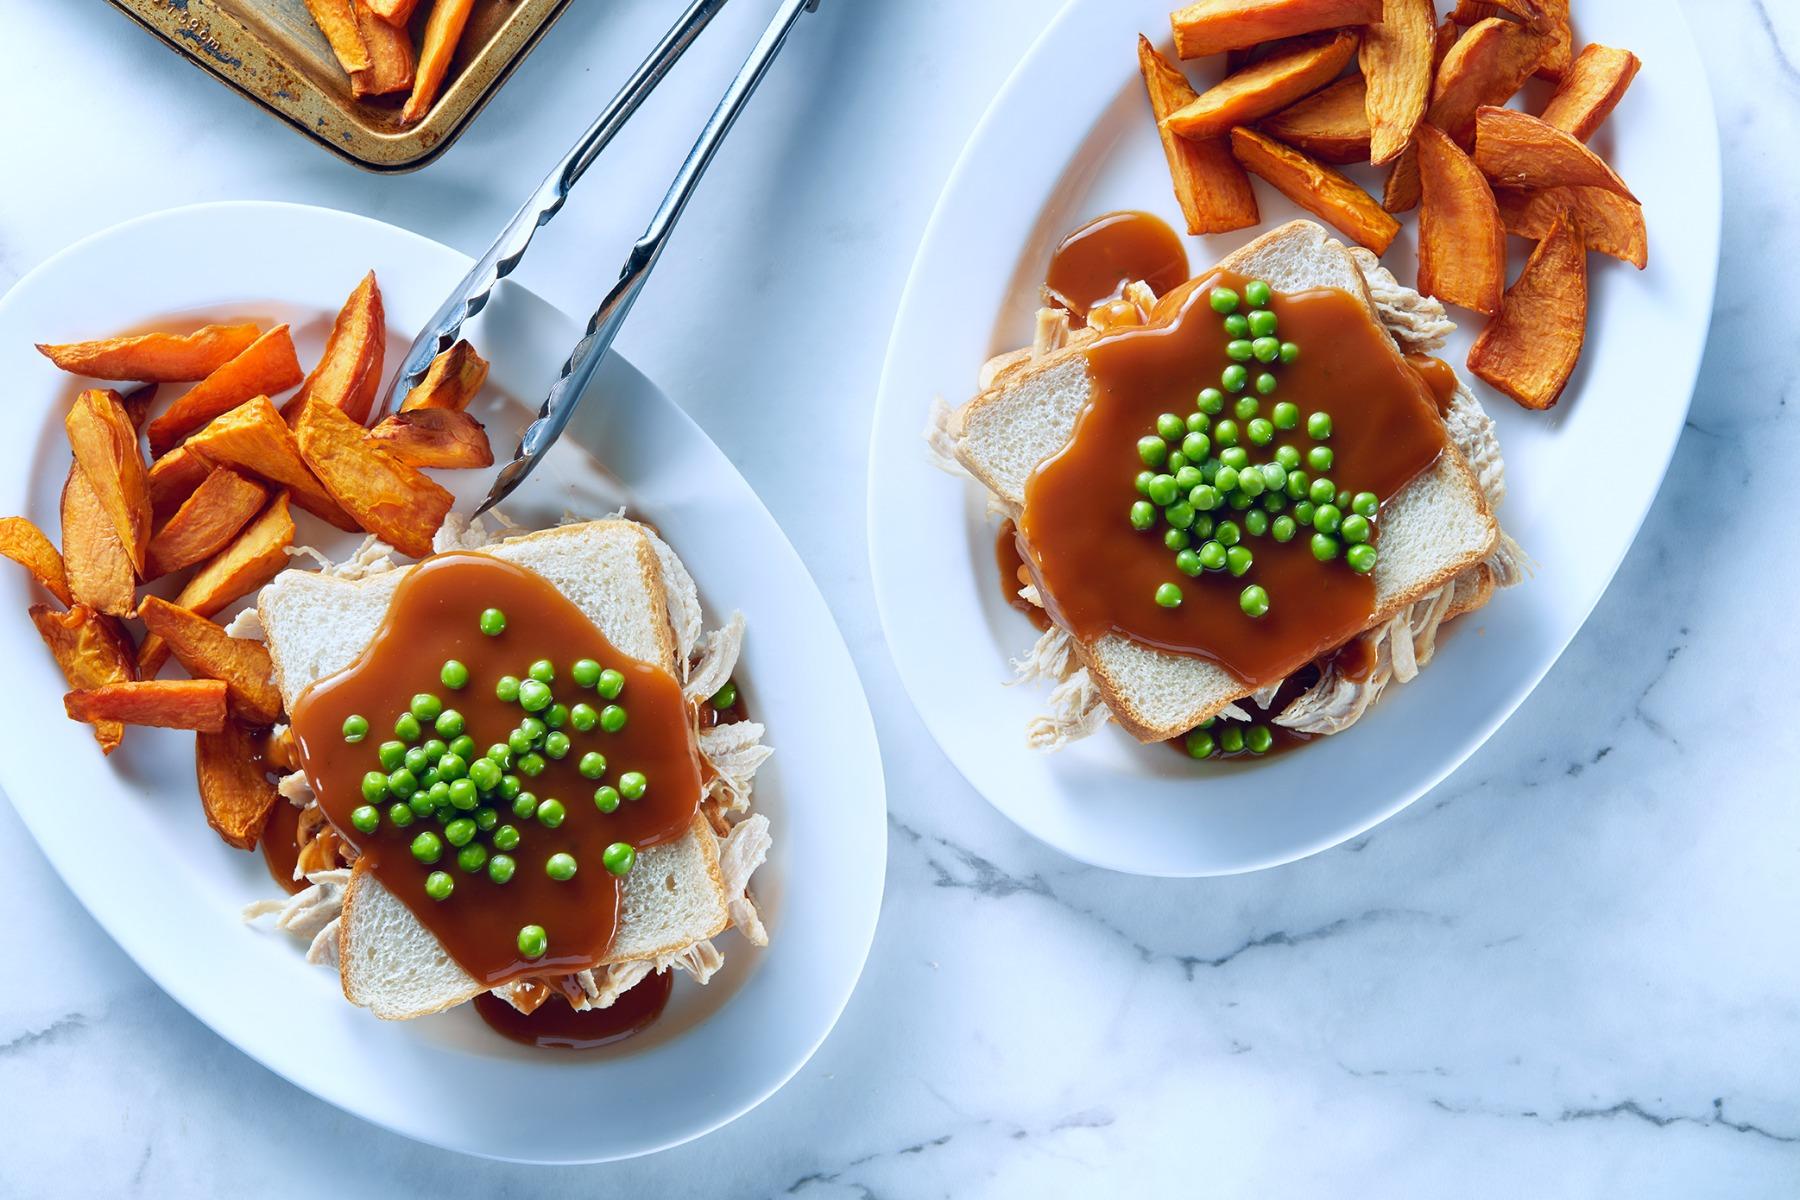 Hot turkey sandwich